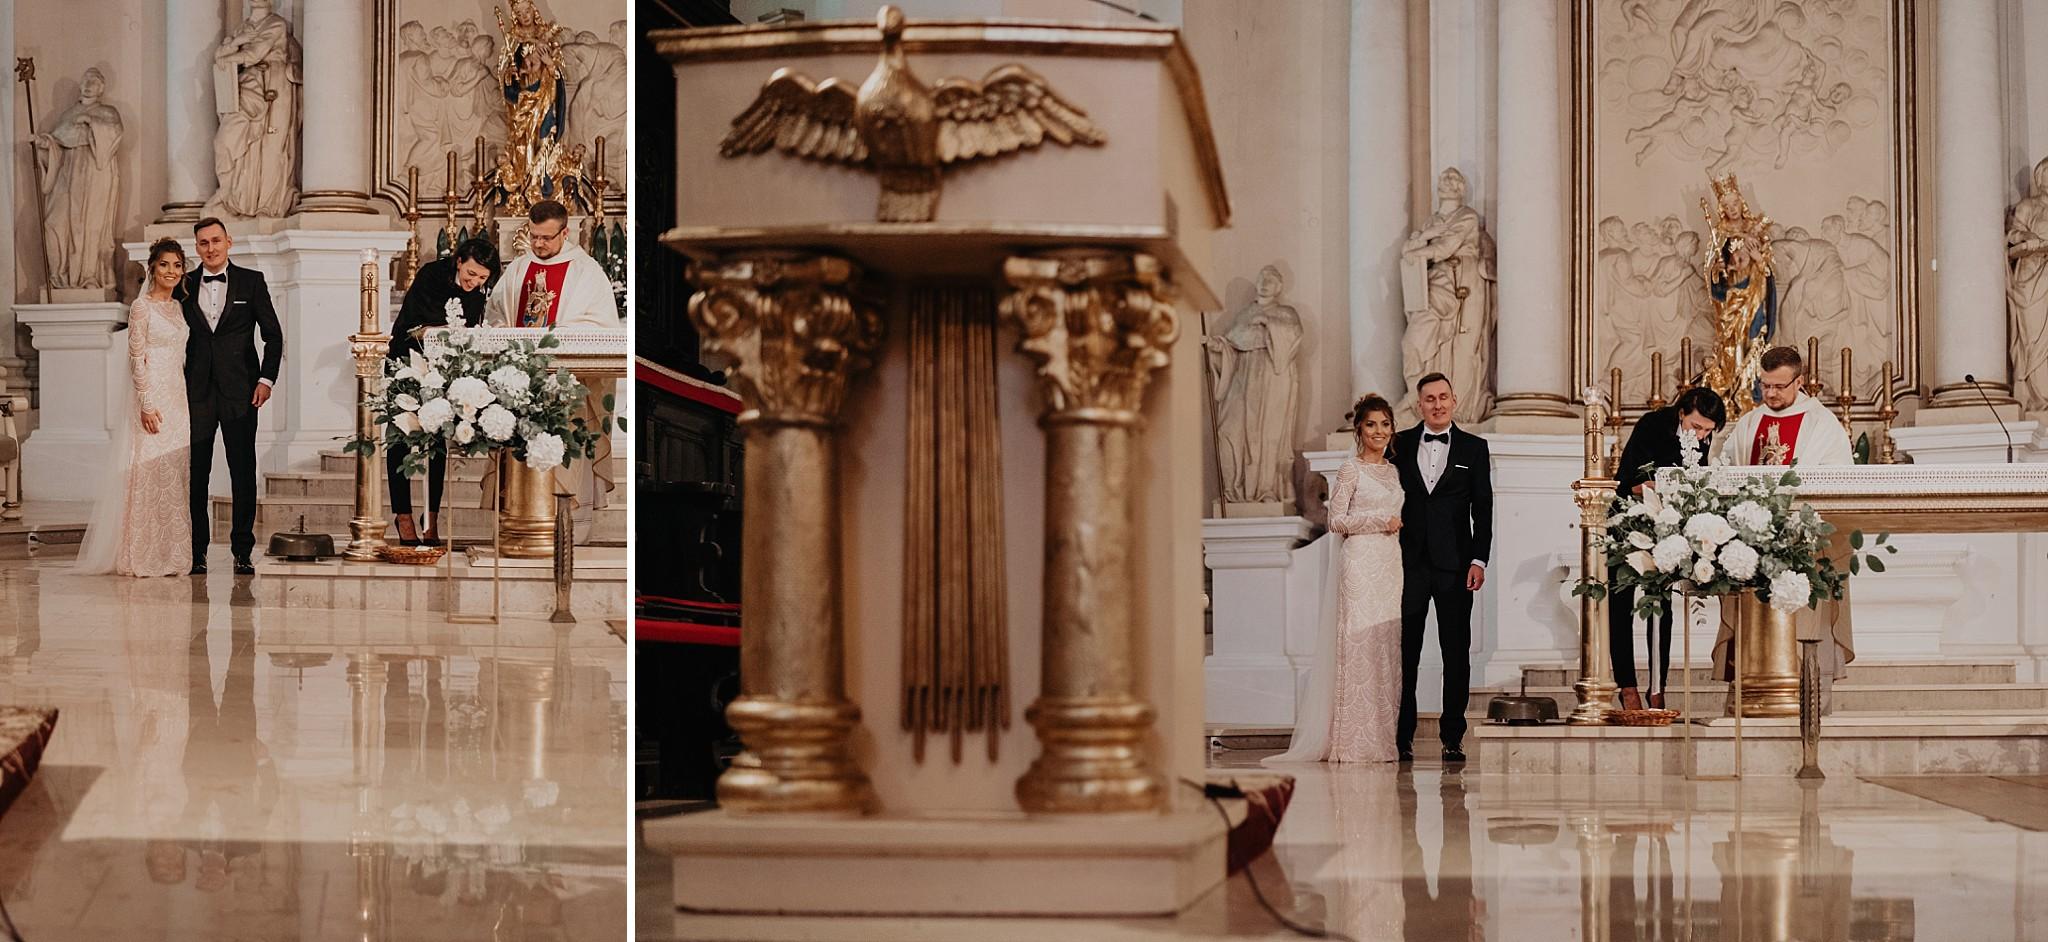 fotograf poznan wesele dobra truskawka piekne wesele pod poznaniem wesele w dobrej truskawce piekna para mloda slub marzen slub koronawirus slub listopad wesele koronawirus 204